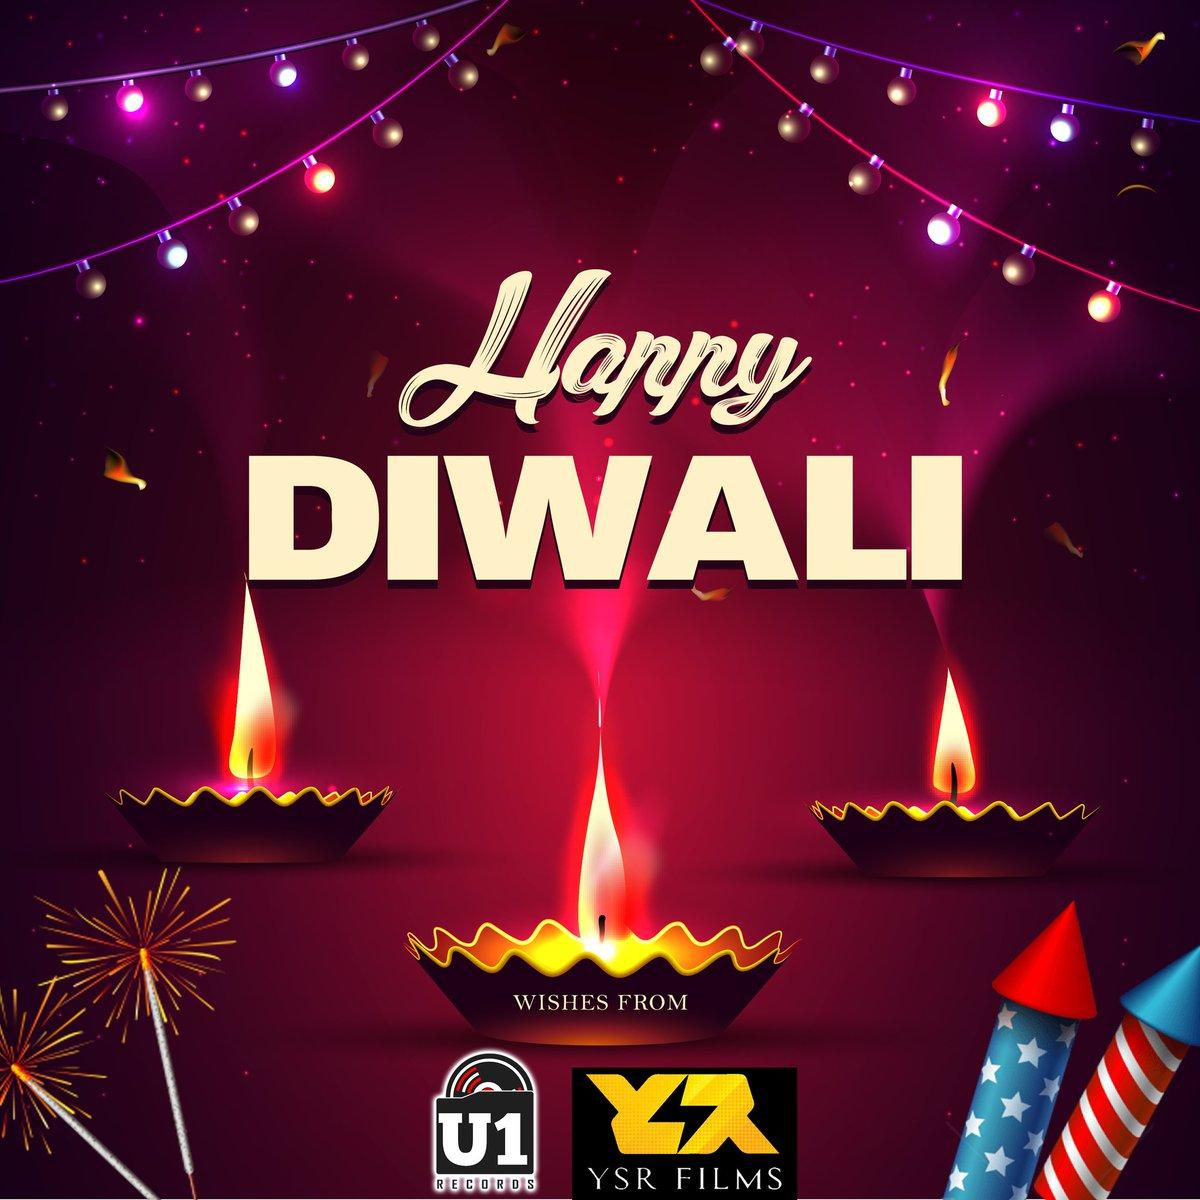 Happy Diwali, Folks! 😊 - @YSRfilms @U1Records Family | @thisisysr @irfanmalik83 #HappyDeepavali https://t.co/6TAdgoUo07